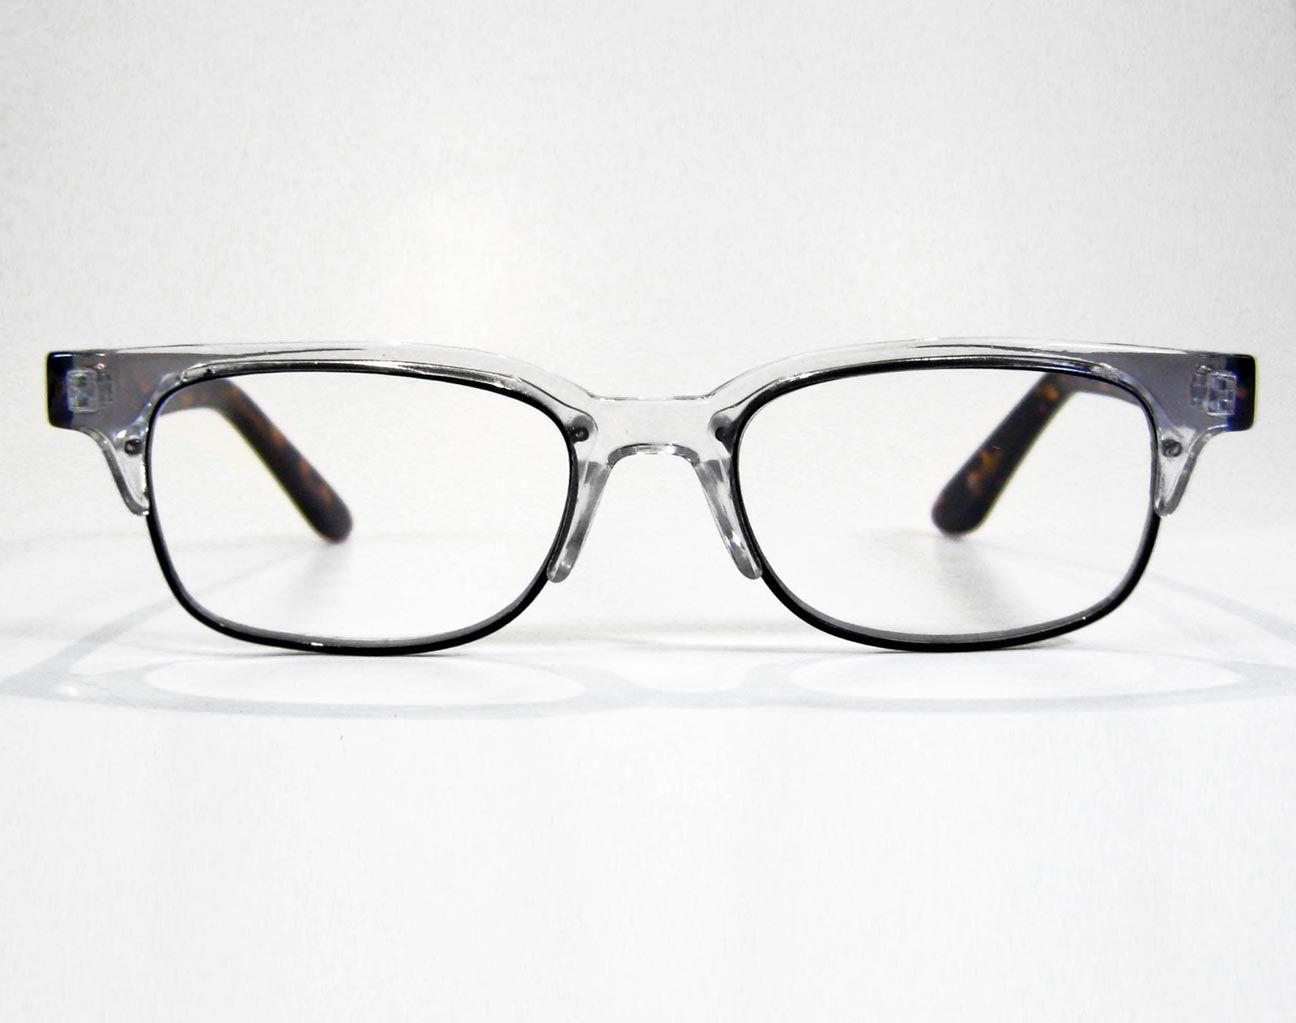 Geek & Nerdy - Charles | Retro Focus Eyewear Clear Browline Reading ...